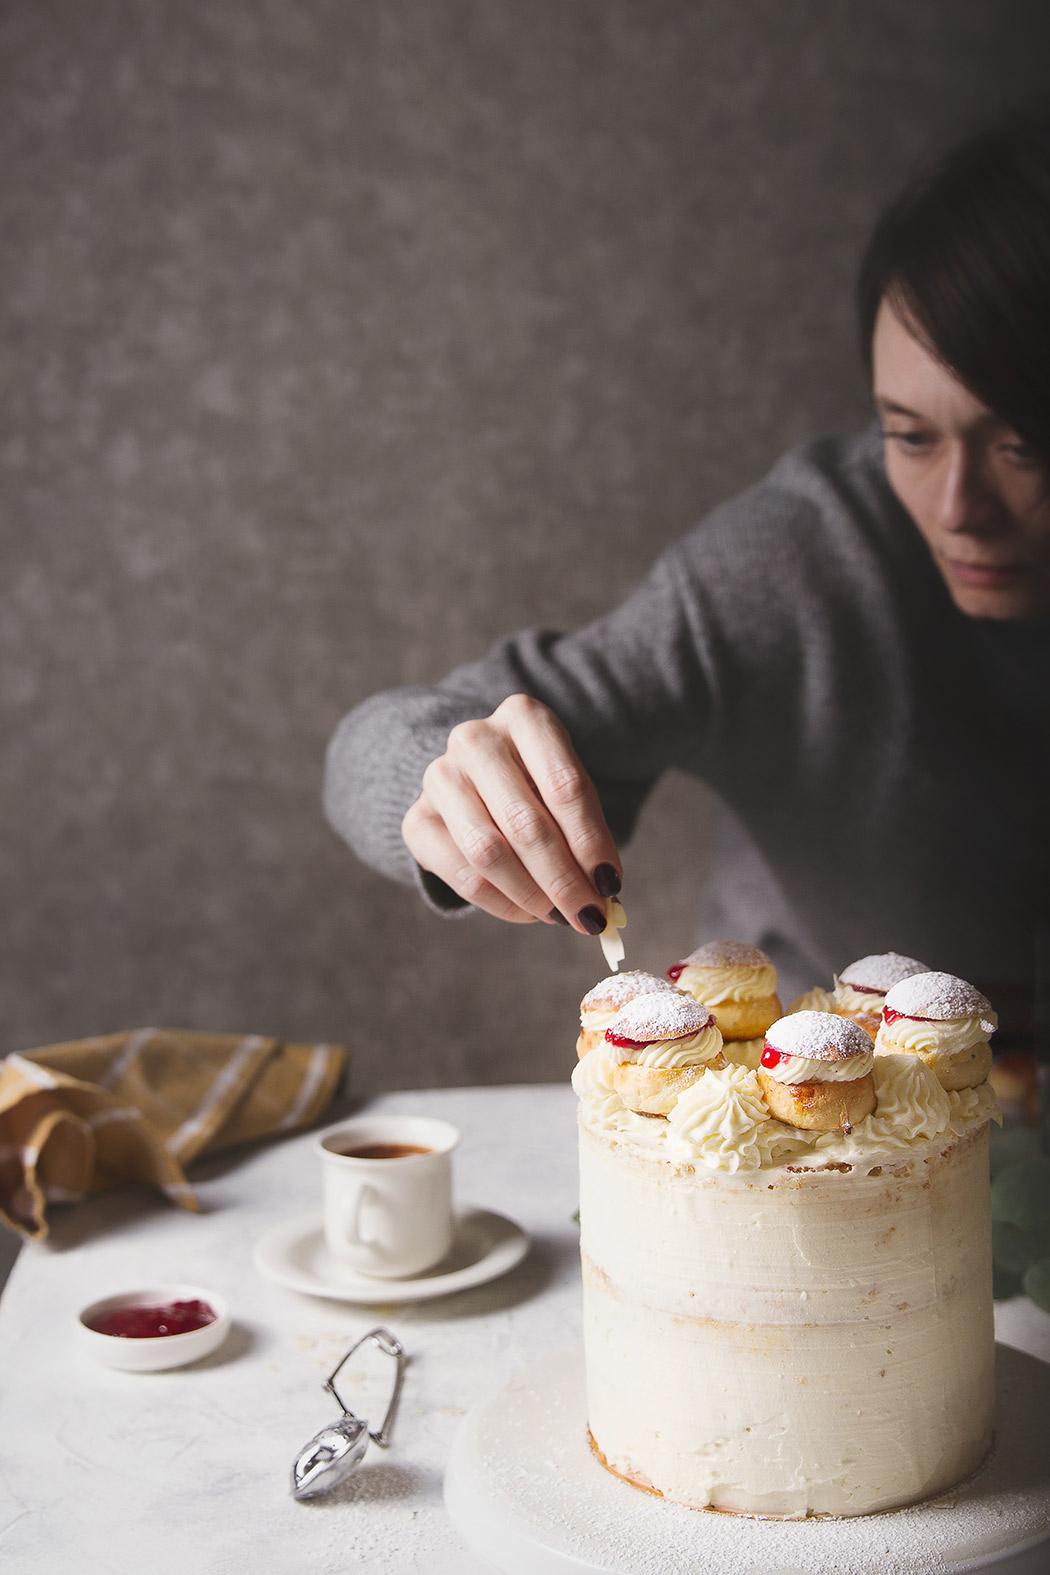 Shovetide cake